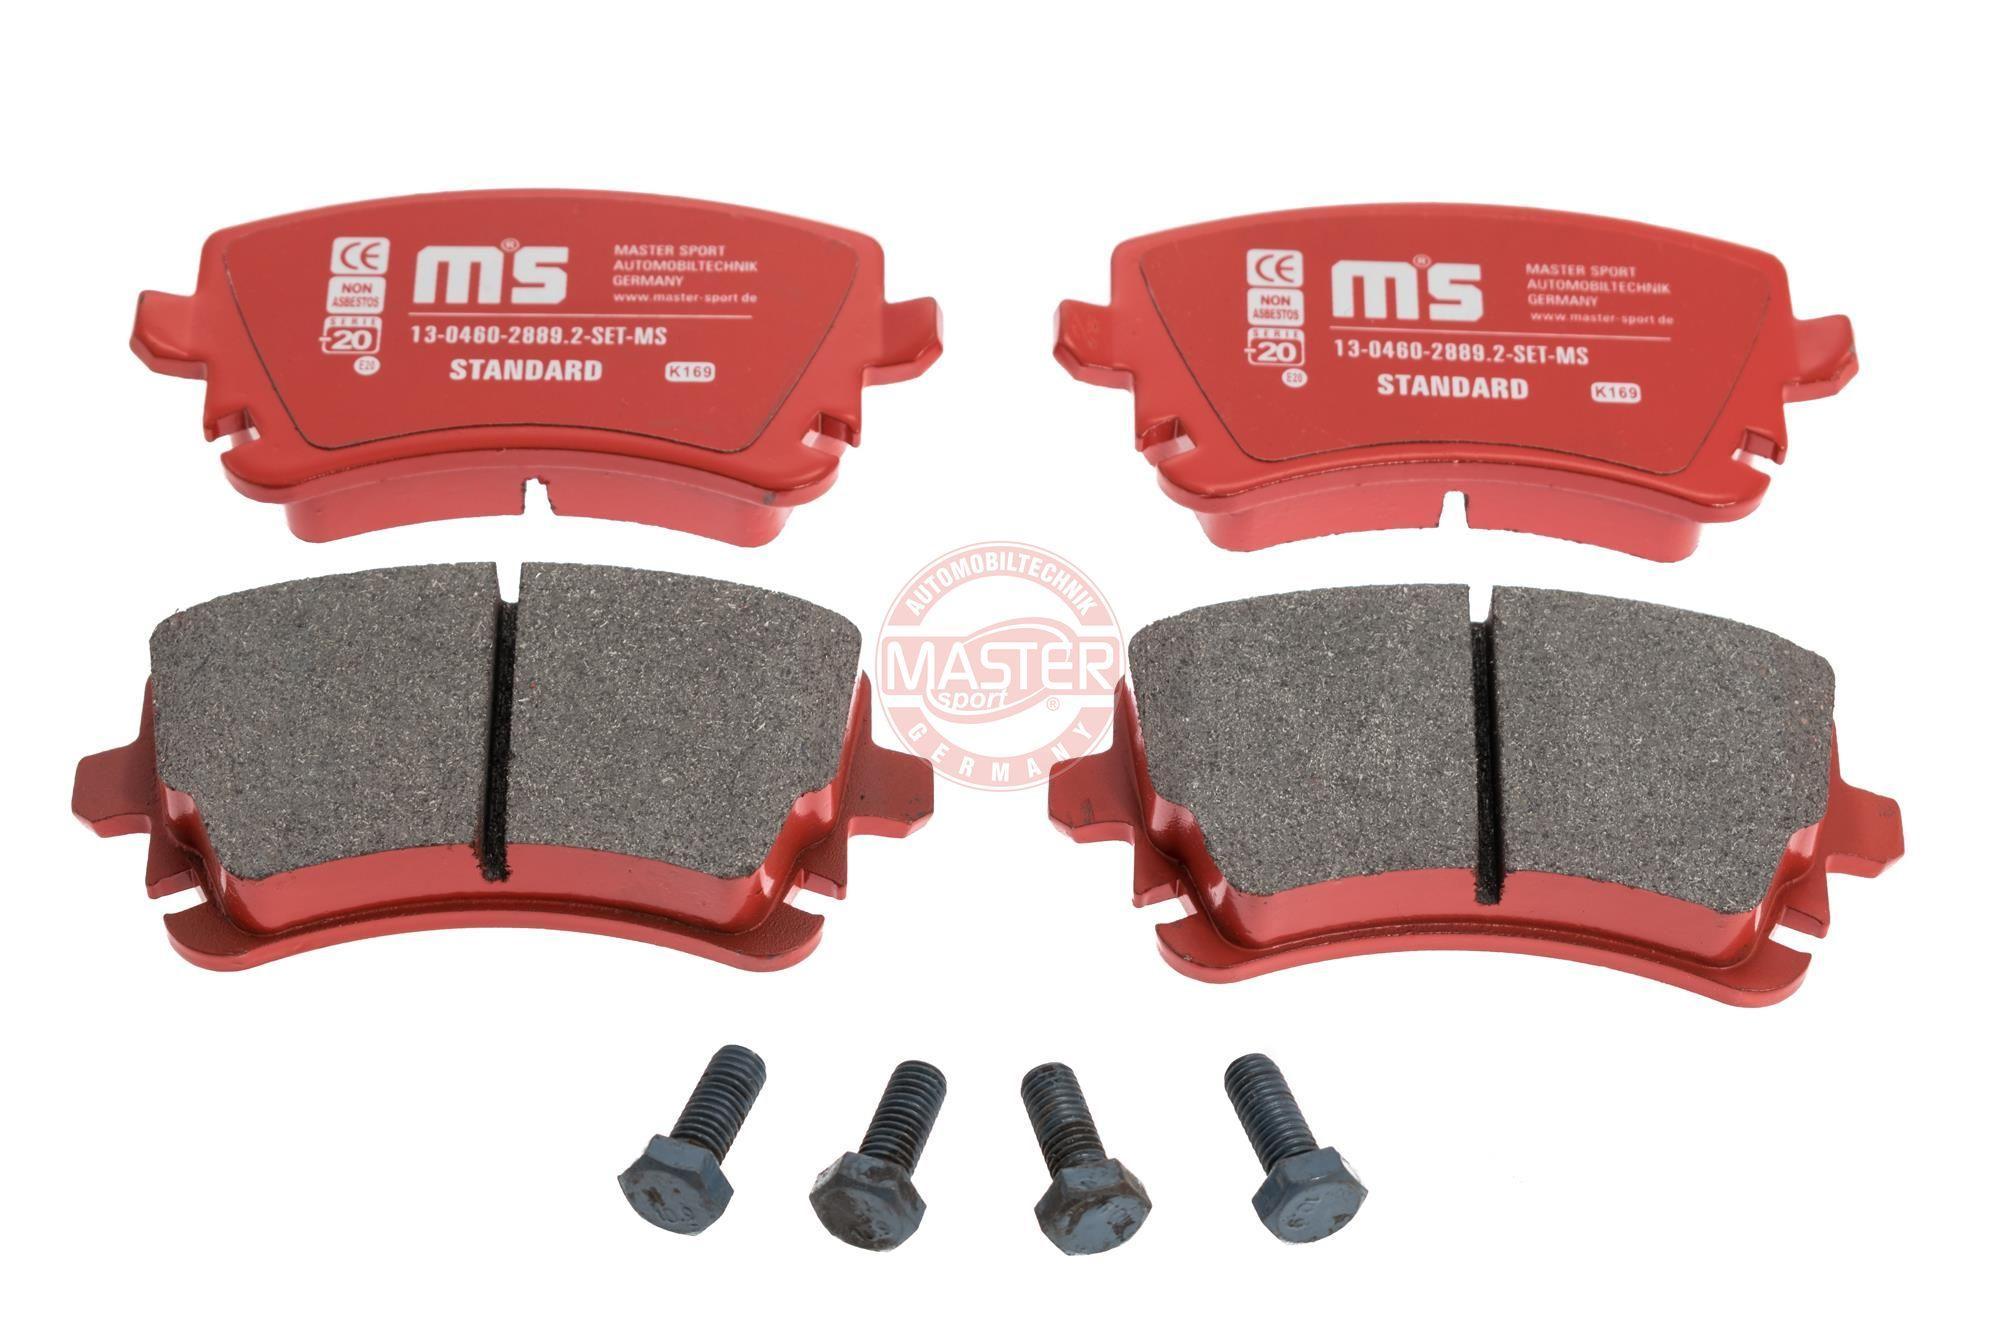 Bremsbelagsatz MASTER-SPORT 13046028892-SET-MS